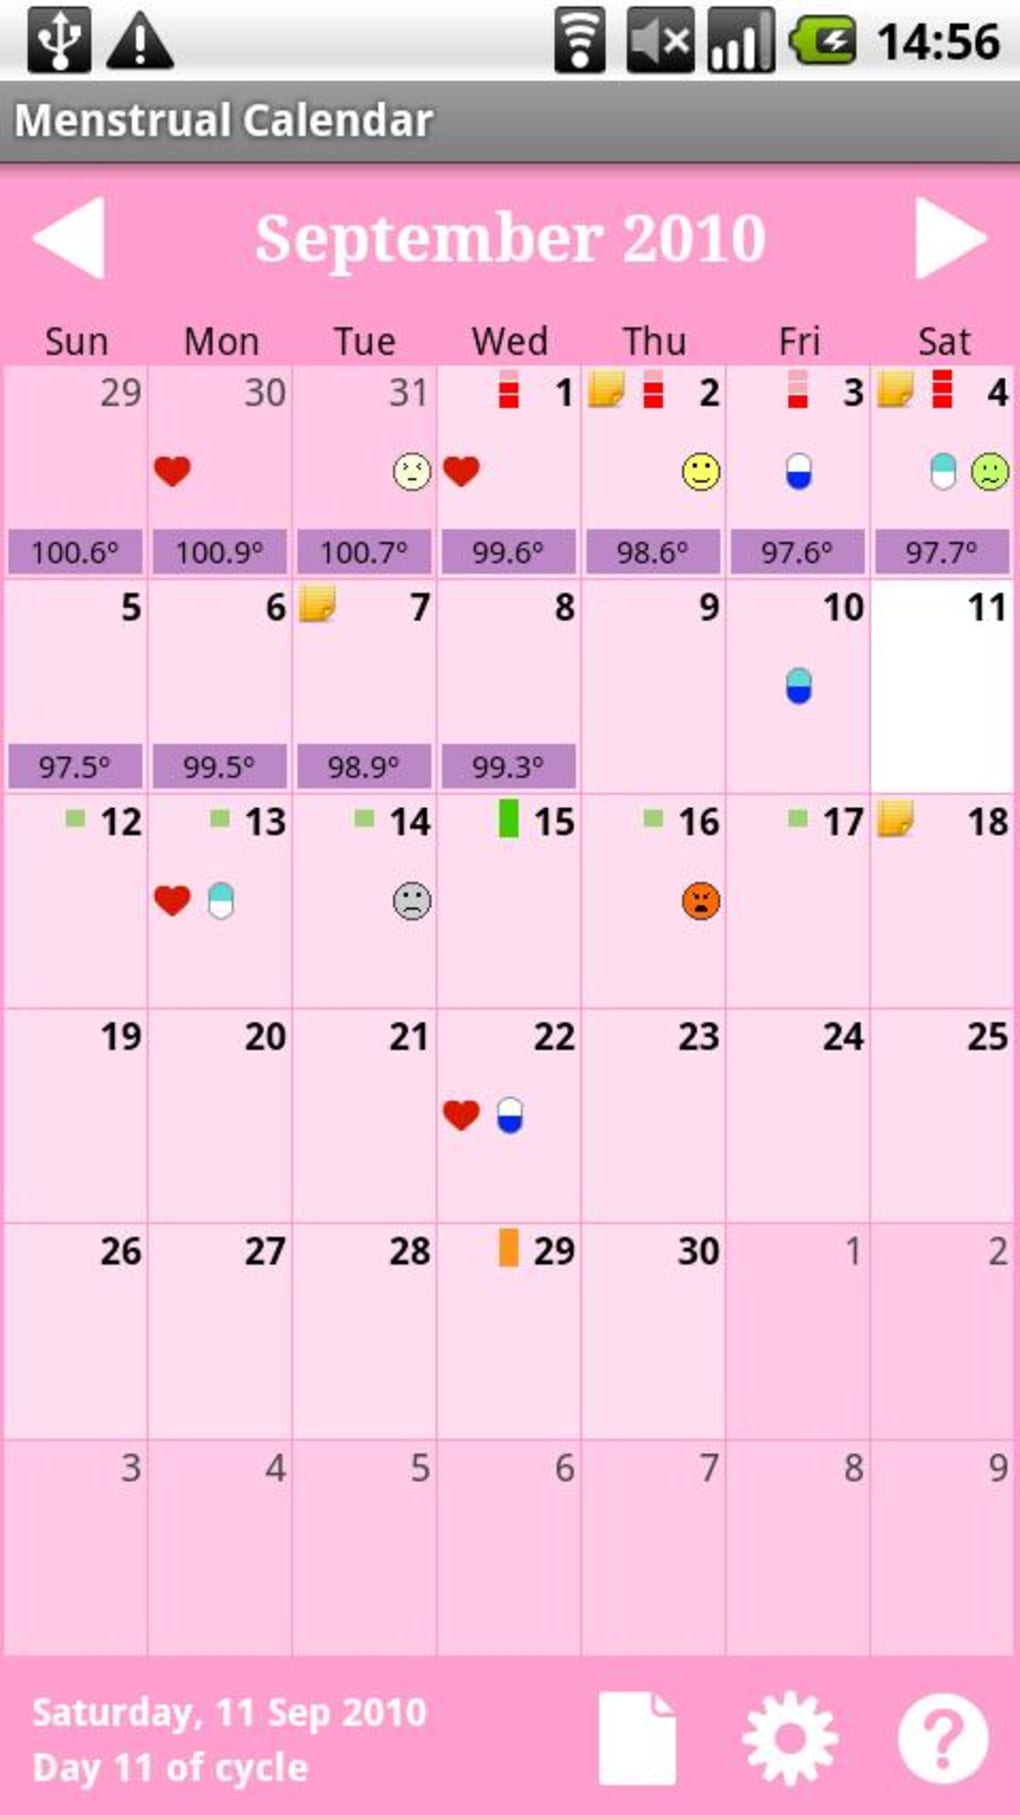 menstrual calendar apk para android descargar. Black Bedroom Furniture Sets. Home Design Ideas